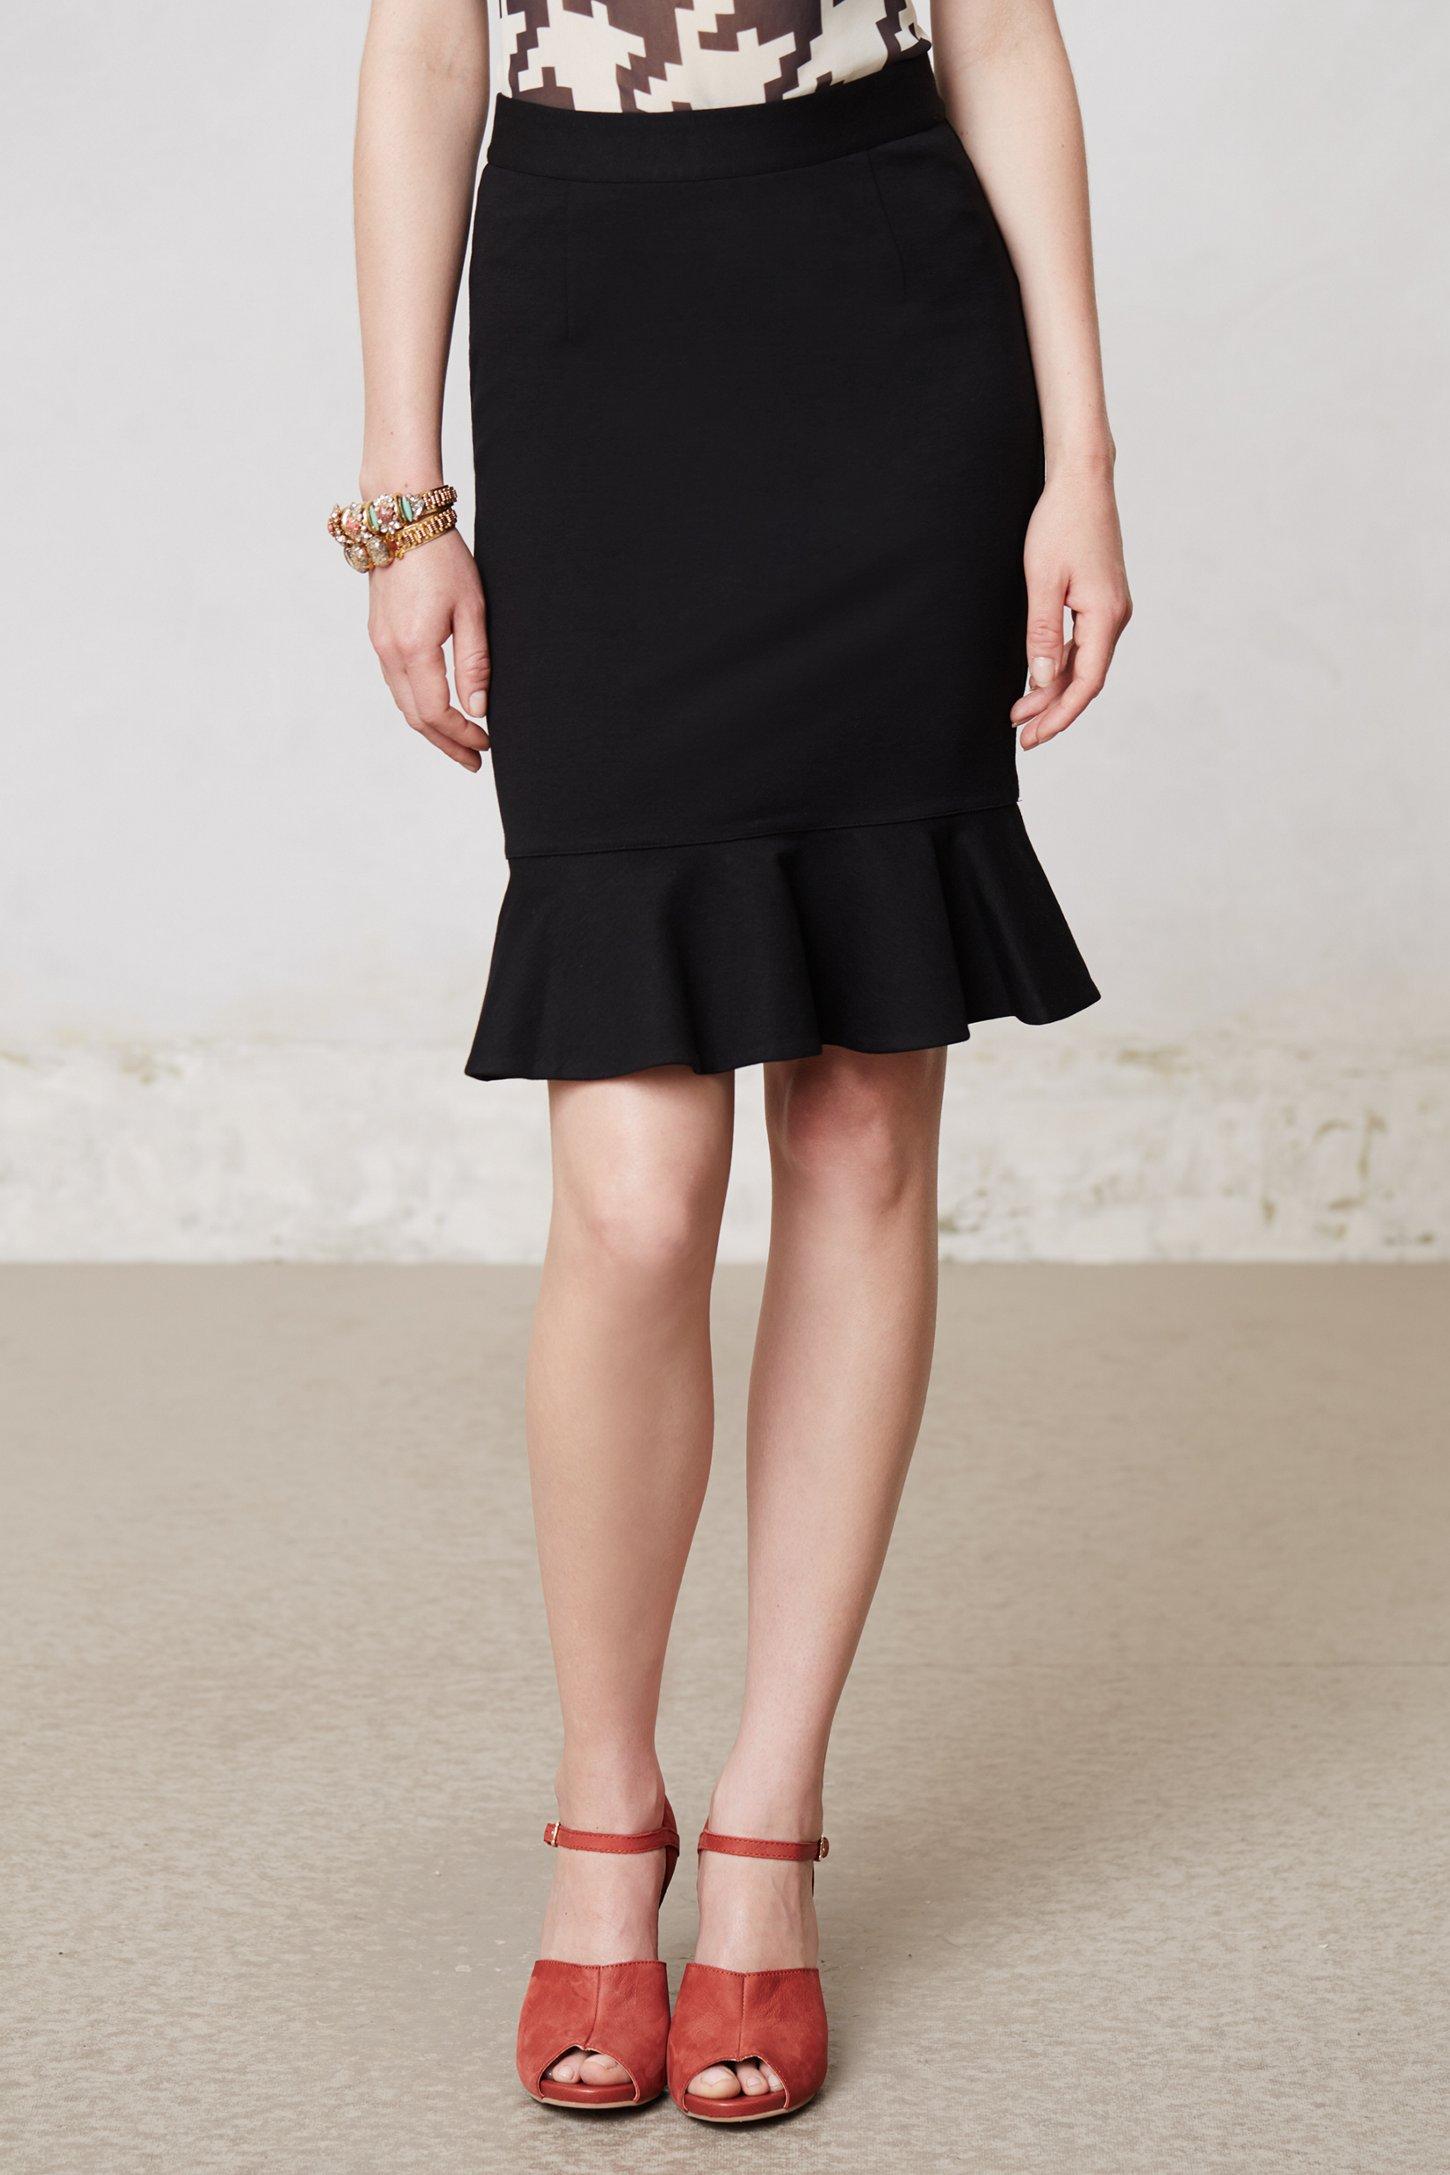 Anthropologie Ruffled Ponte Pencil Skirt in Black | Lyst